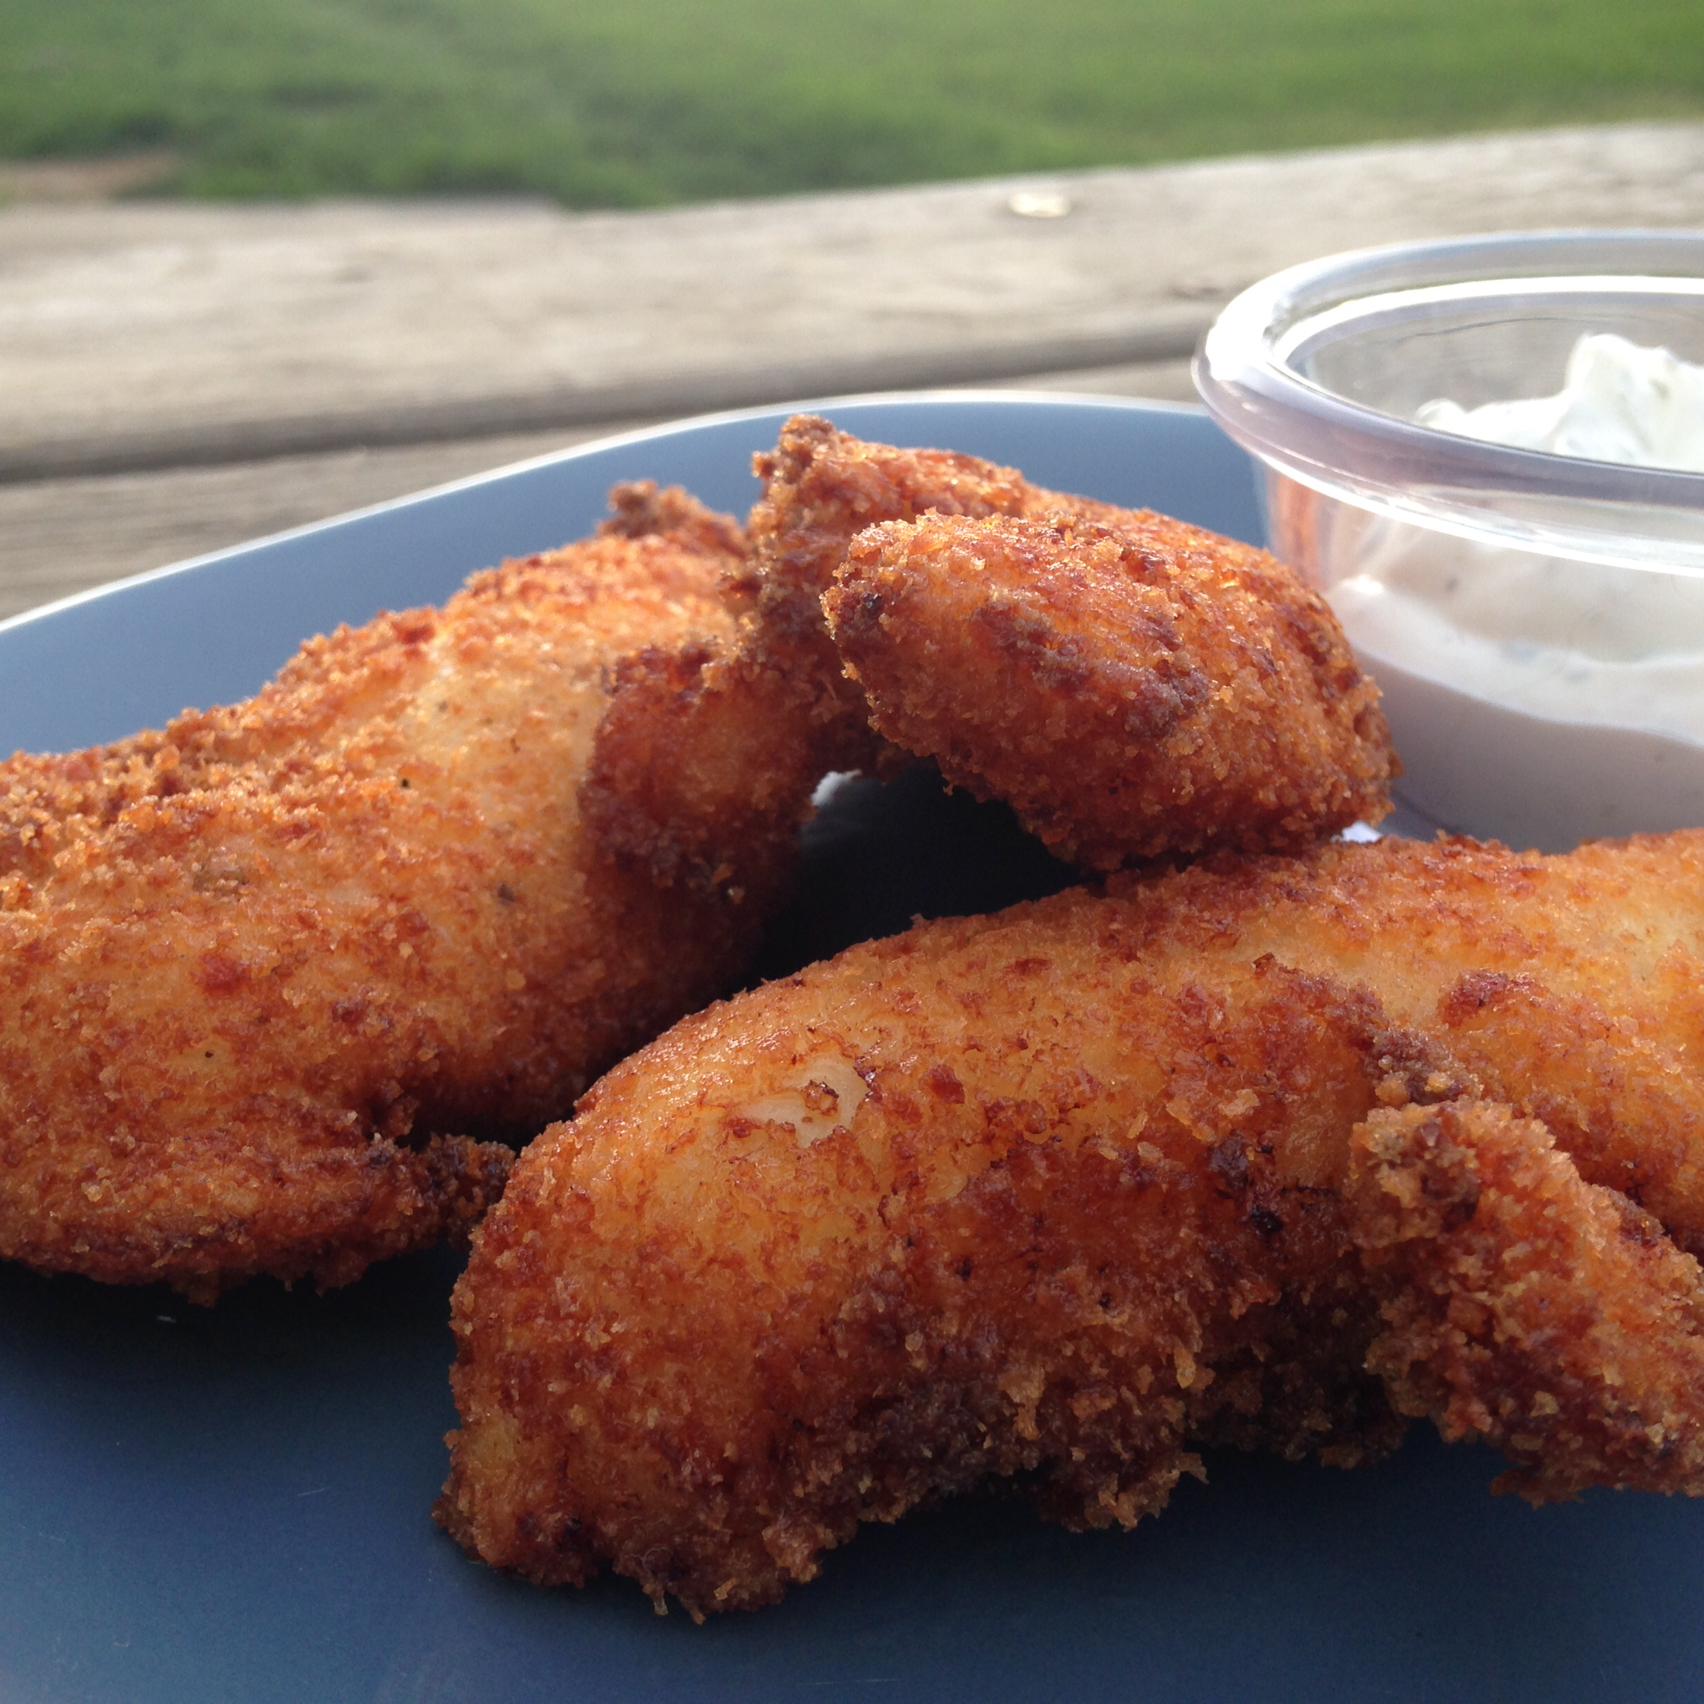 Kiki's Favorite Deep-Fried Buttermilk Chicken Tenders Lady Linda